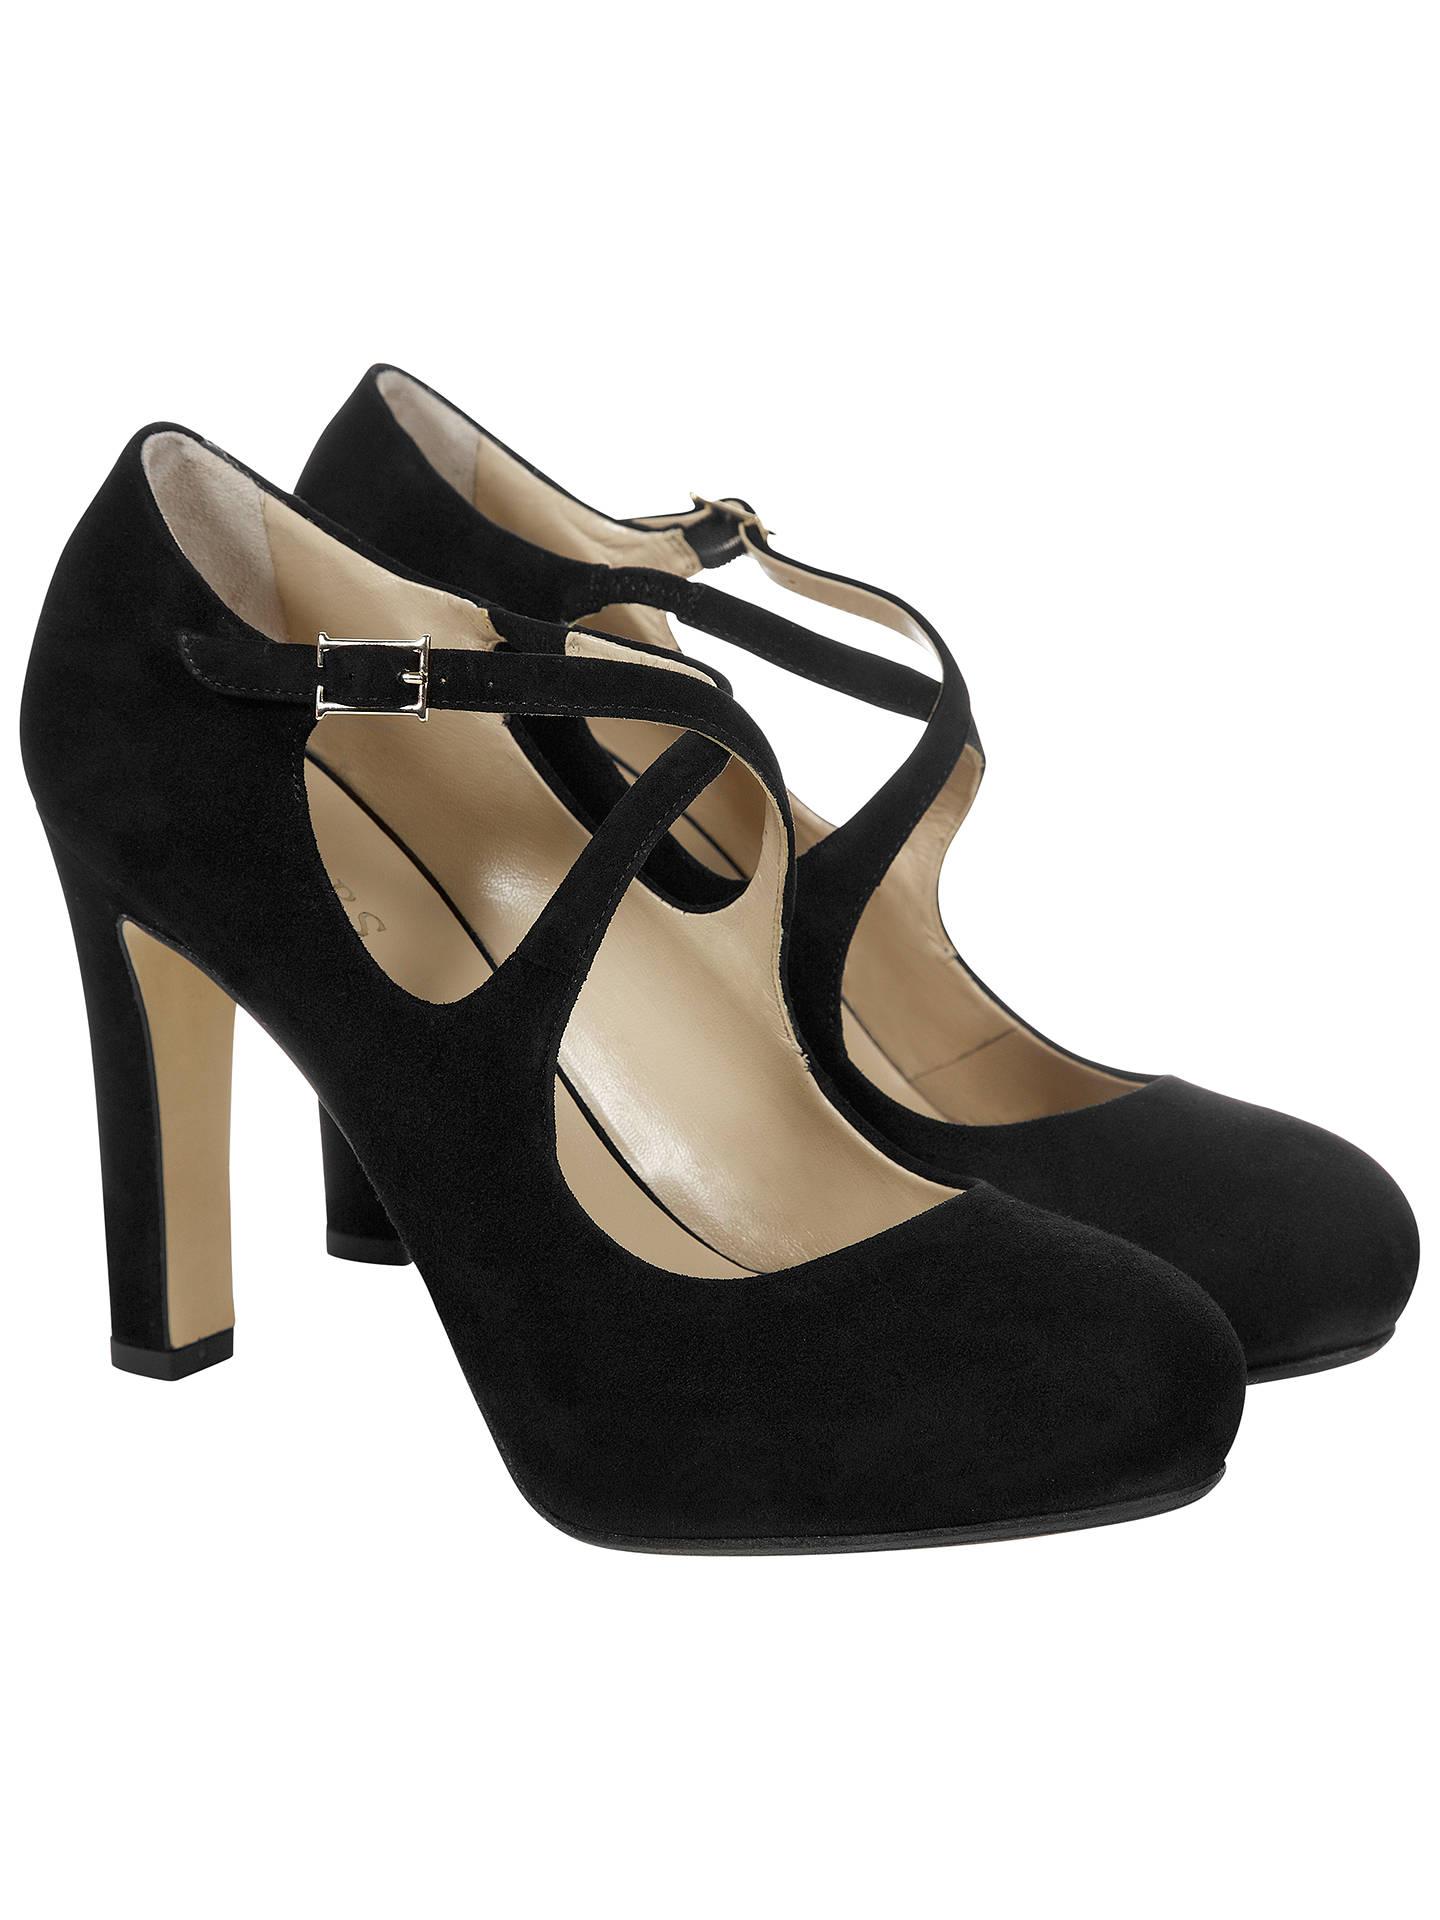 3653527ef0dde Hobbs Fae High Heel Cross Over Strap Court Shoes, Black Suede at ...